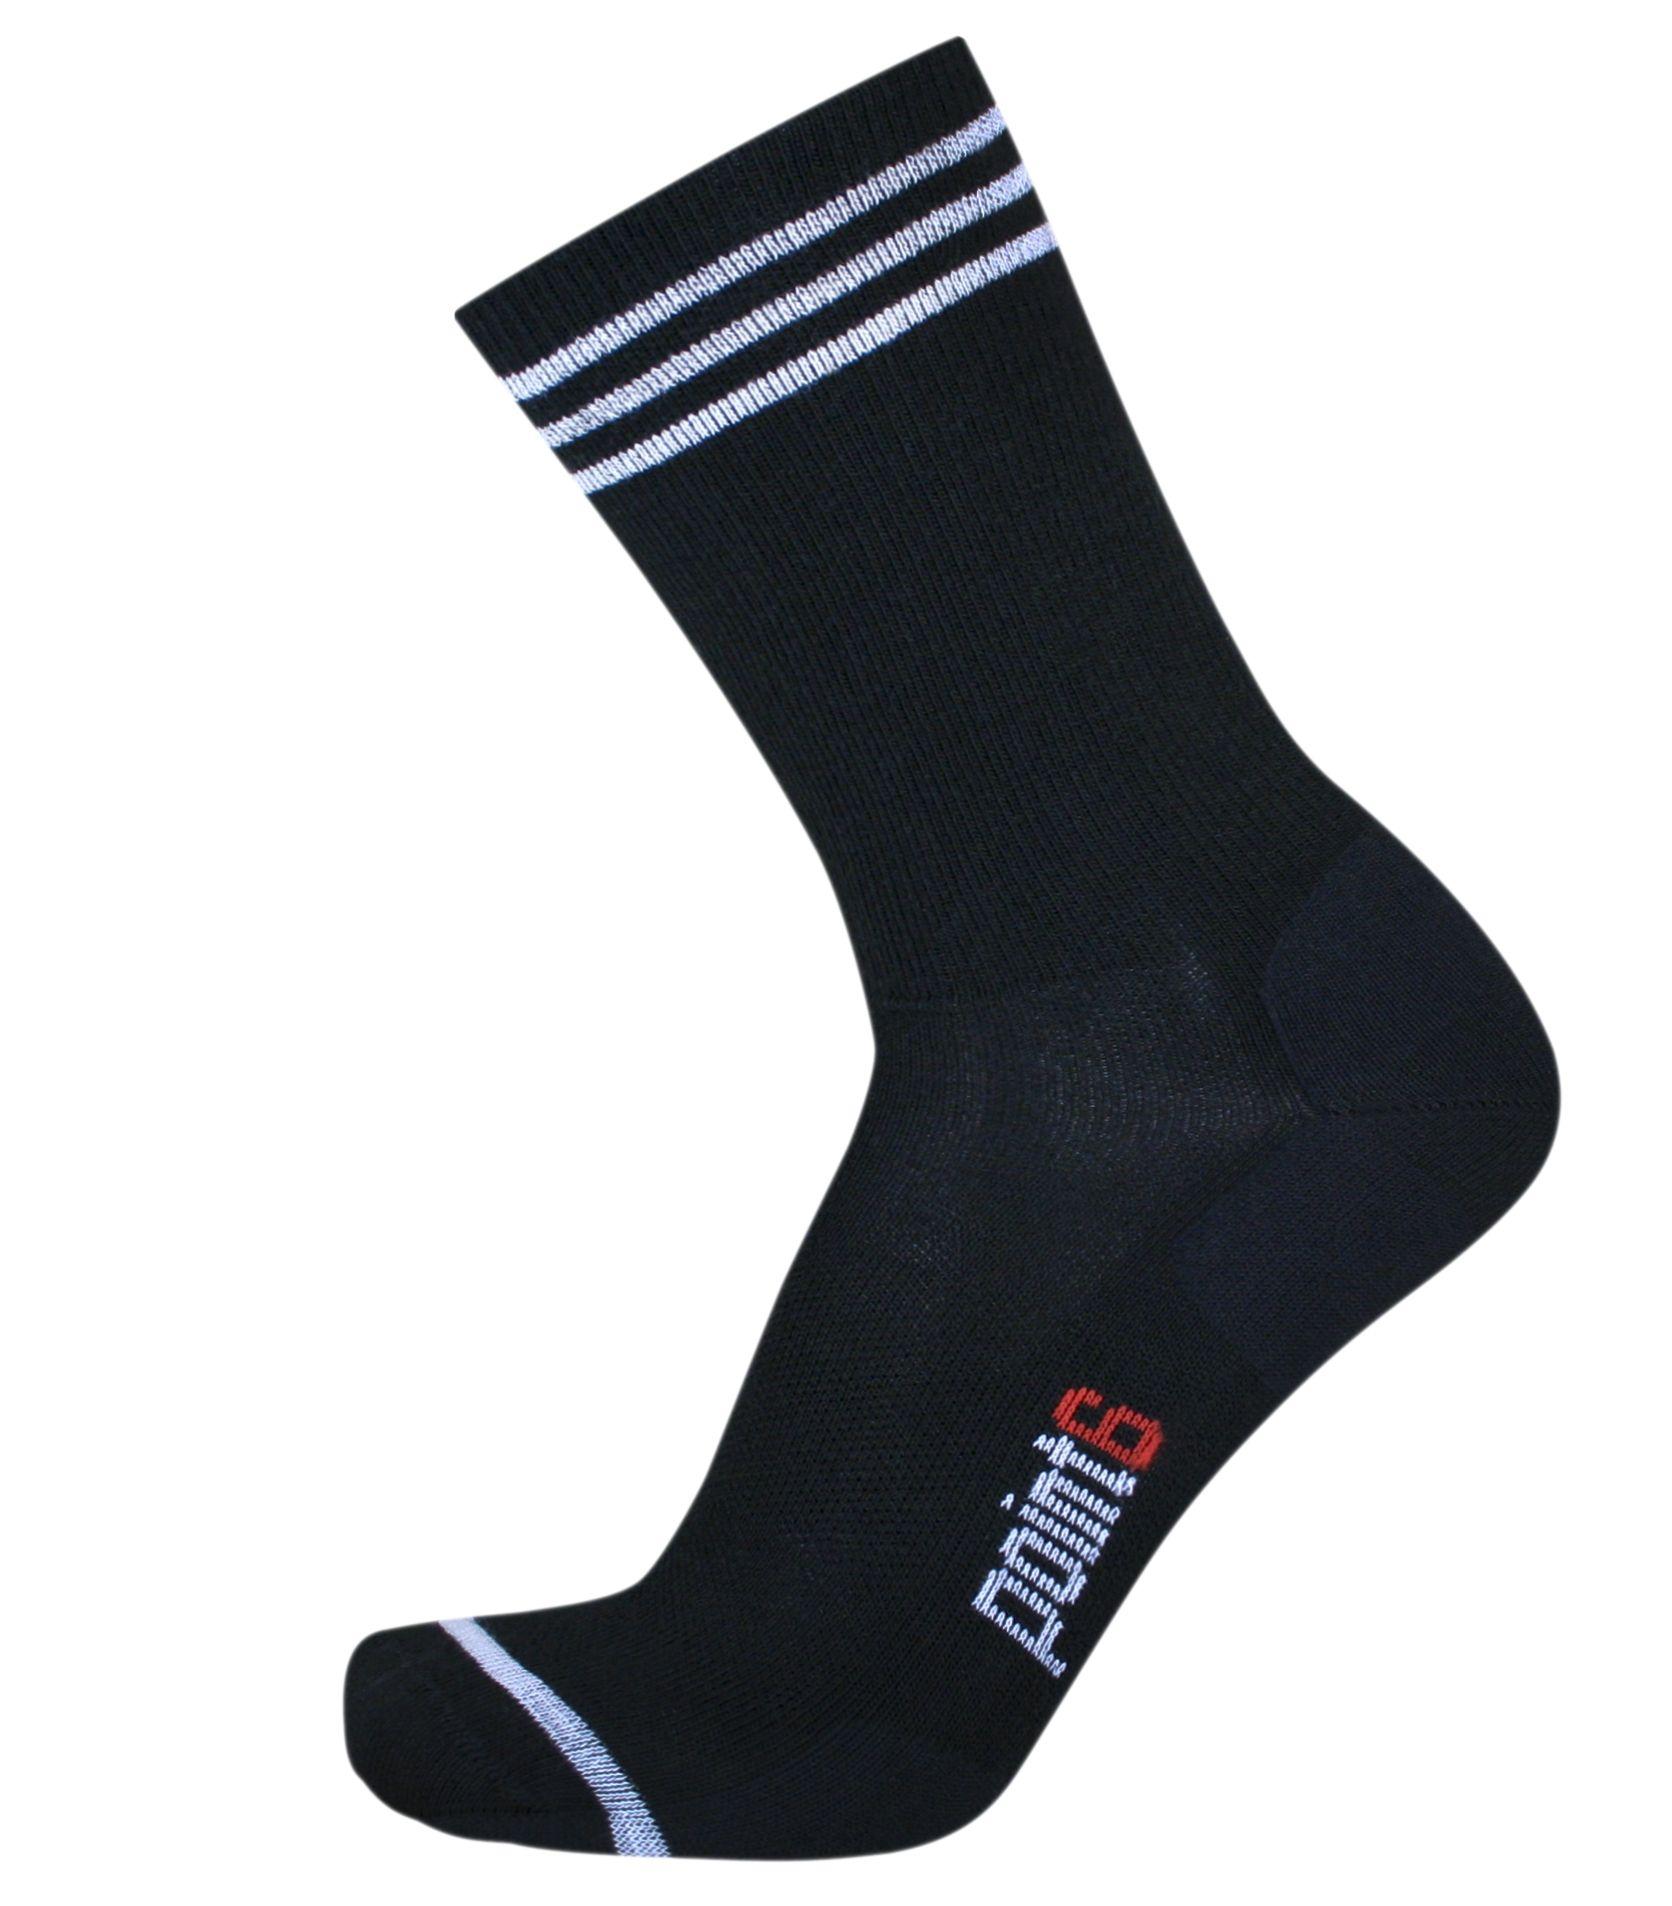 Piston ultra light black socks fashion black